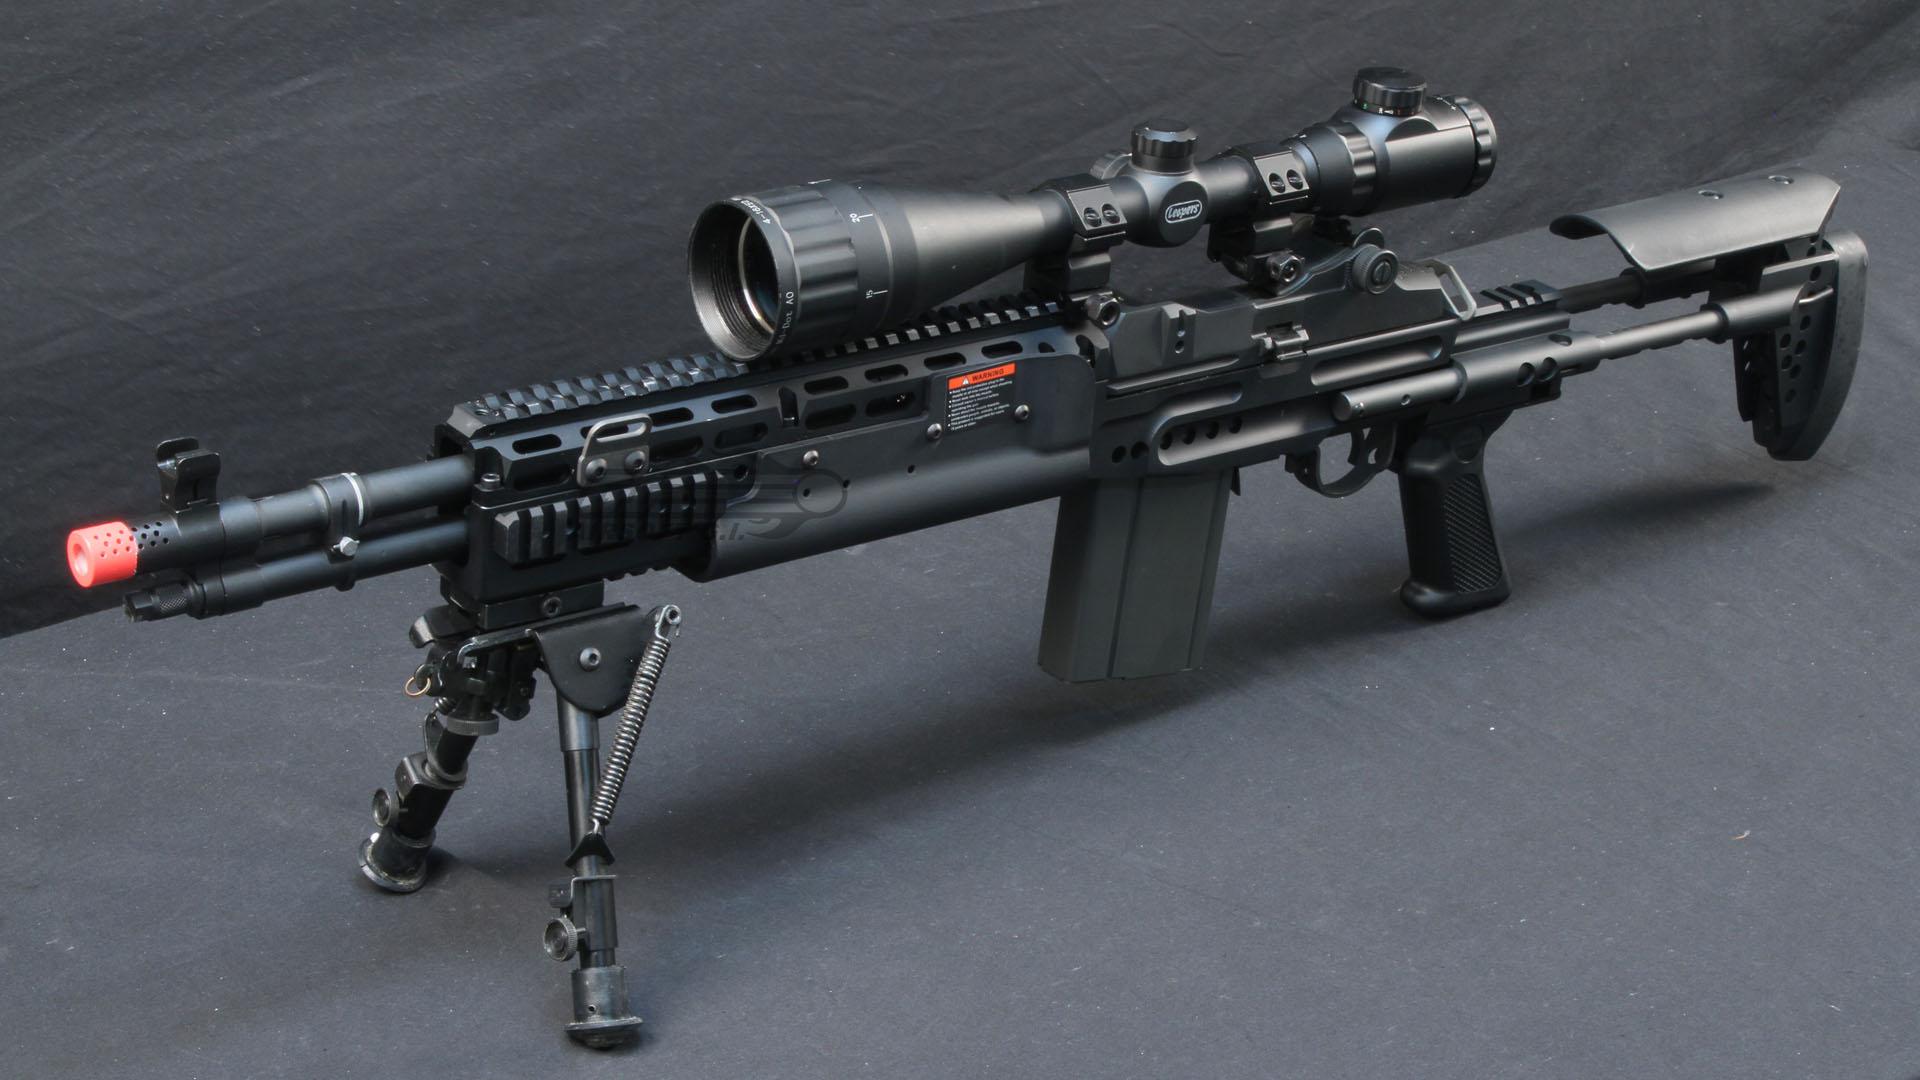 M14 Rifle Wallpaper | www.imgkid.com - The Image Kid Has It! M14 Wallpaper